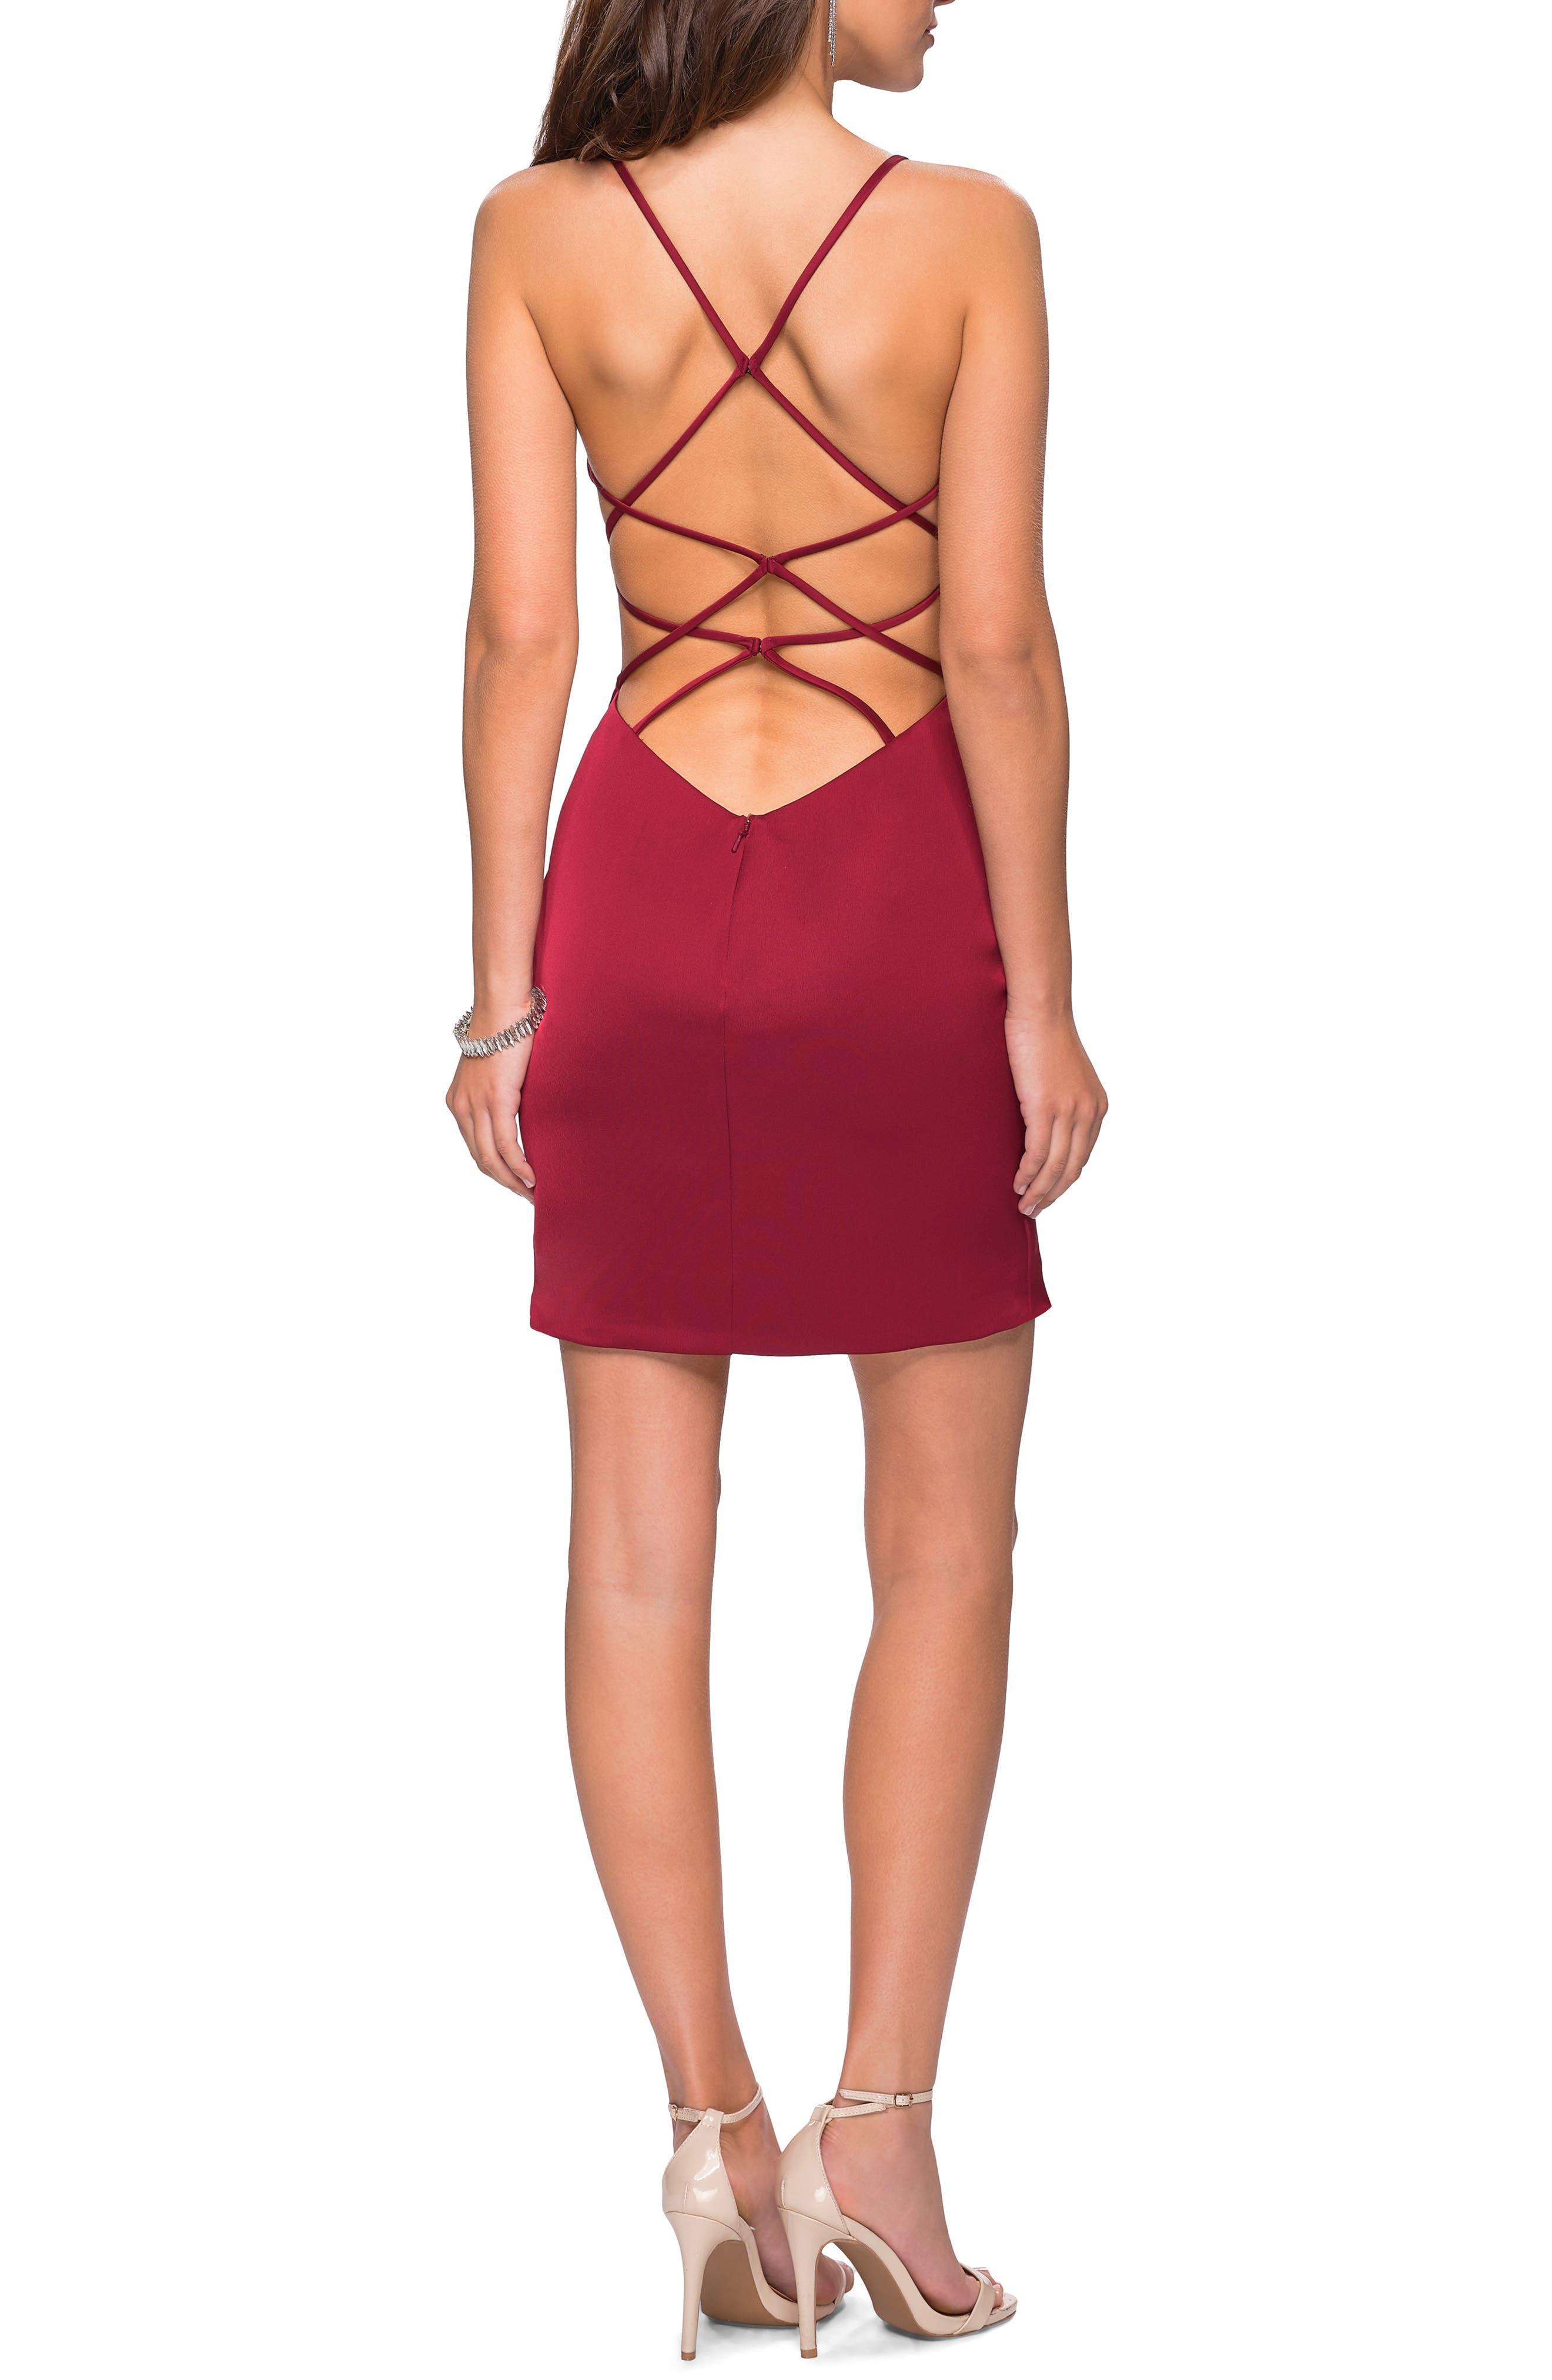 LA FEMME, Strappy Back Satin Party Dress, Alternate thumbnail 2, color, BURGUNDY